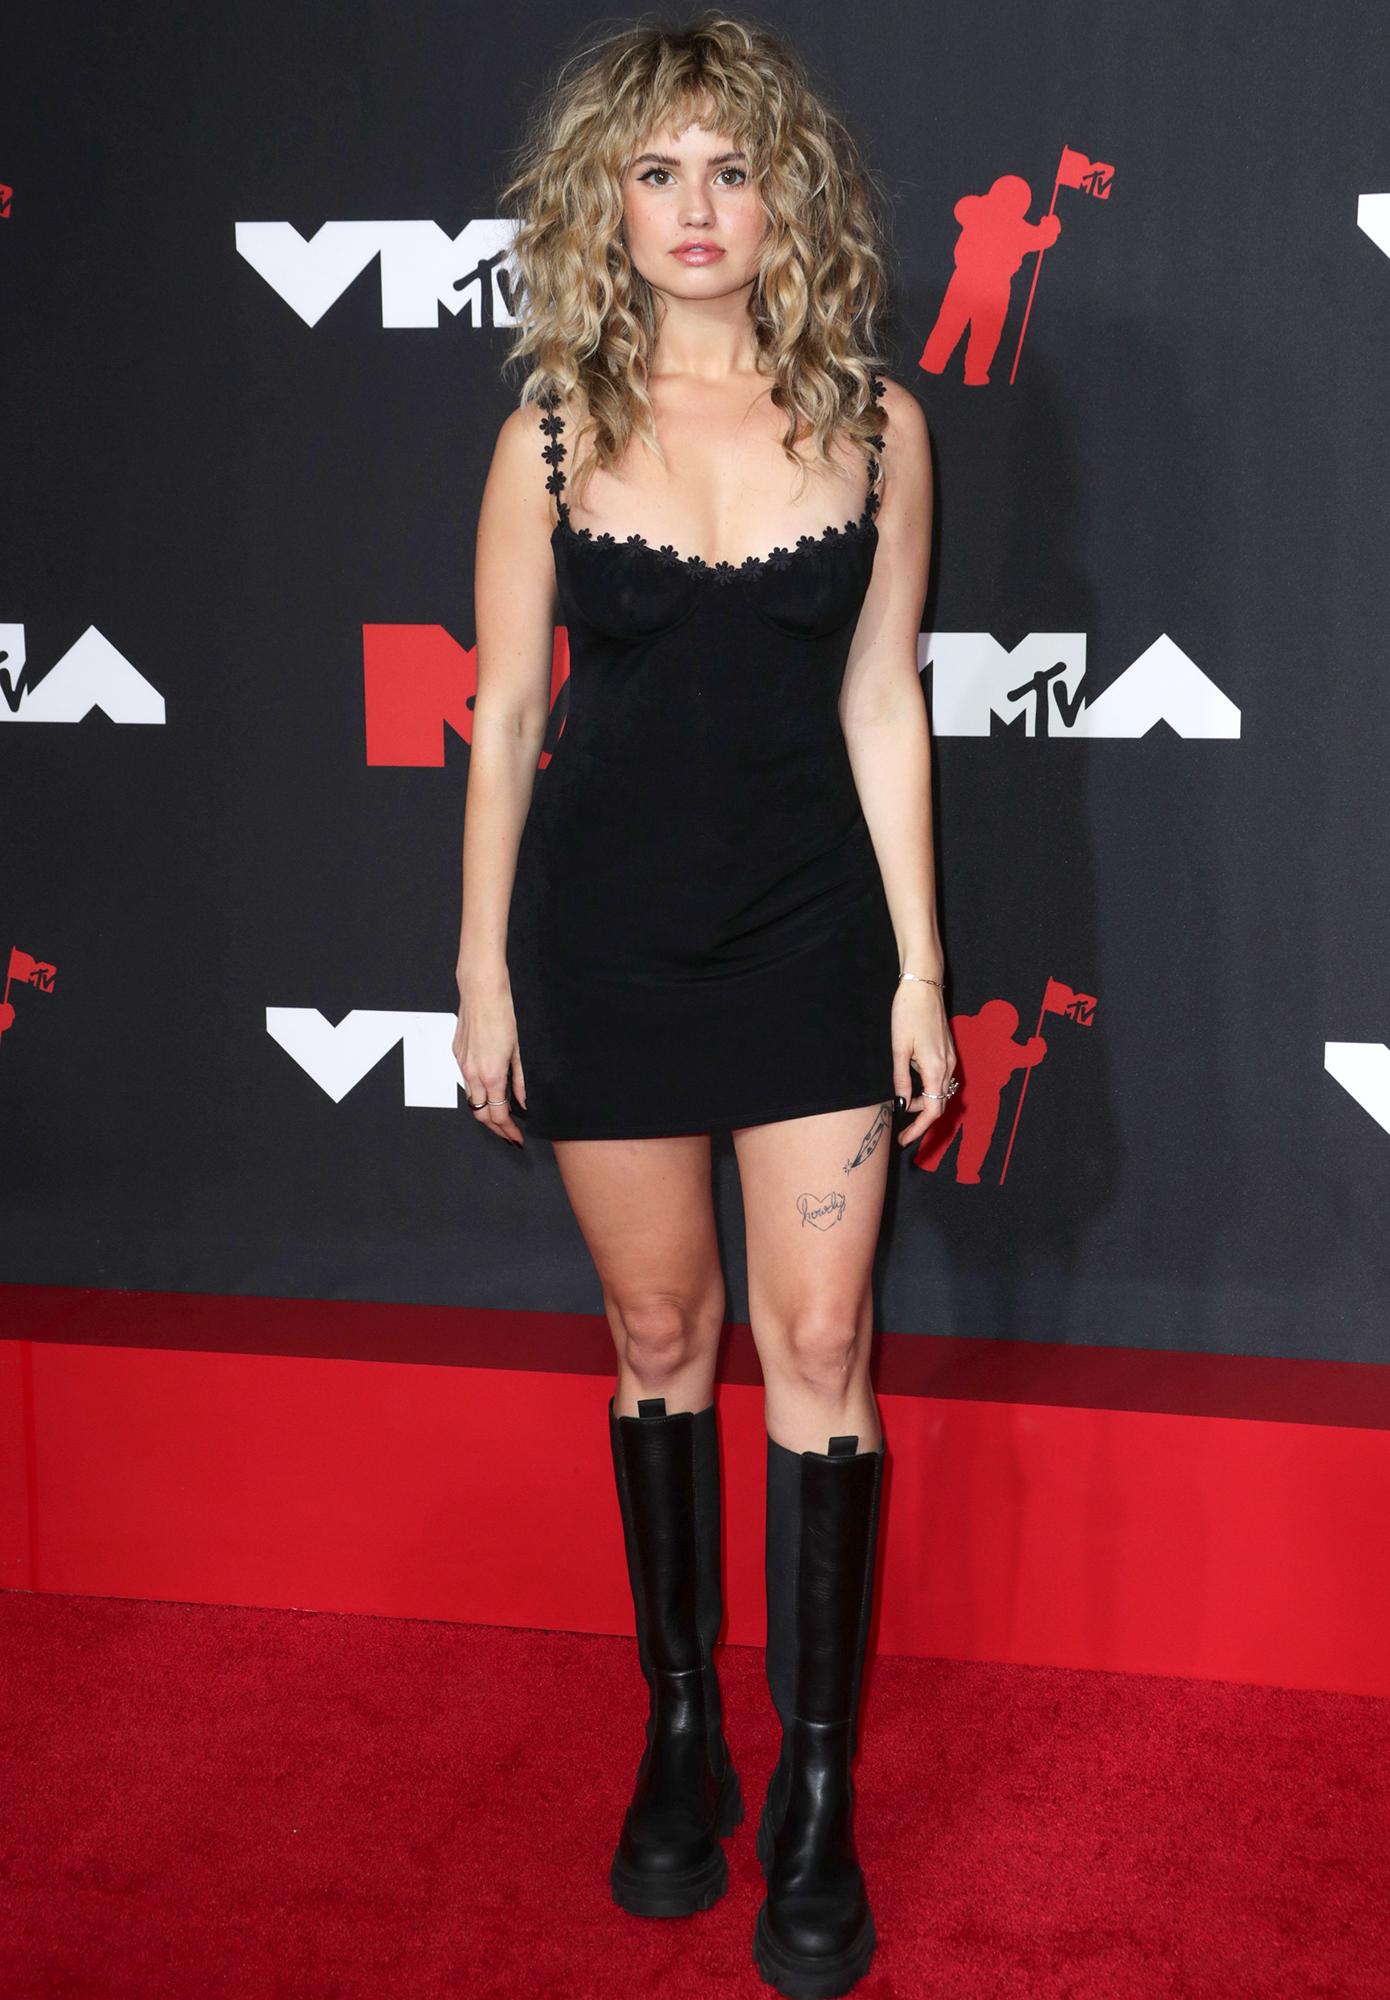 Debby Ryan arrives at the 2021 MTV Video Music Awards